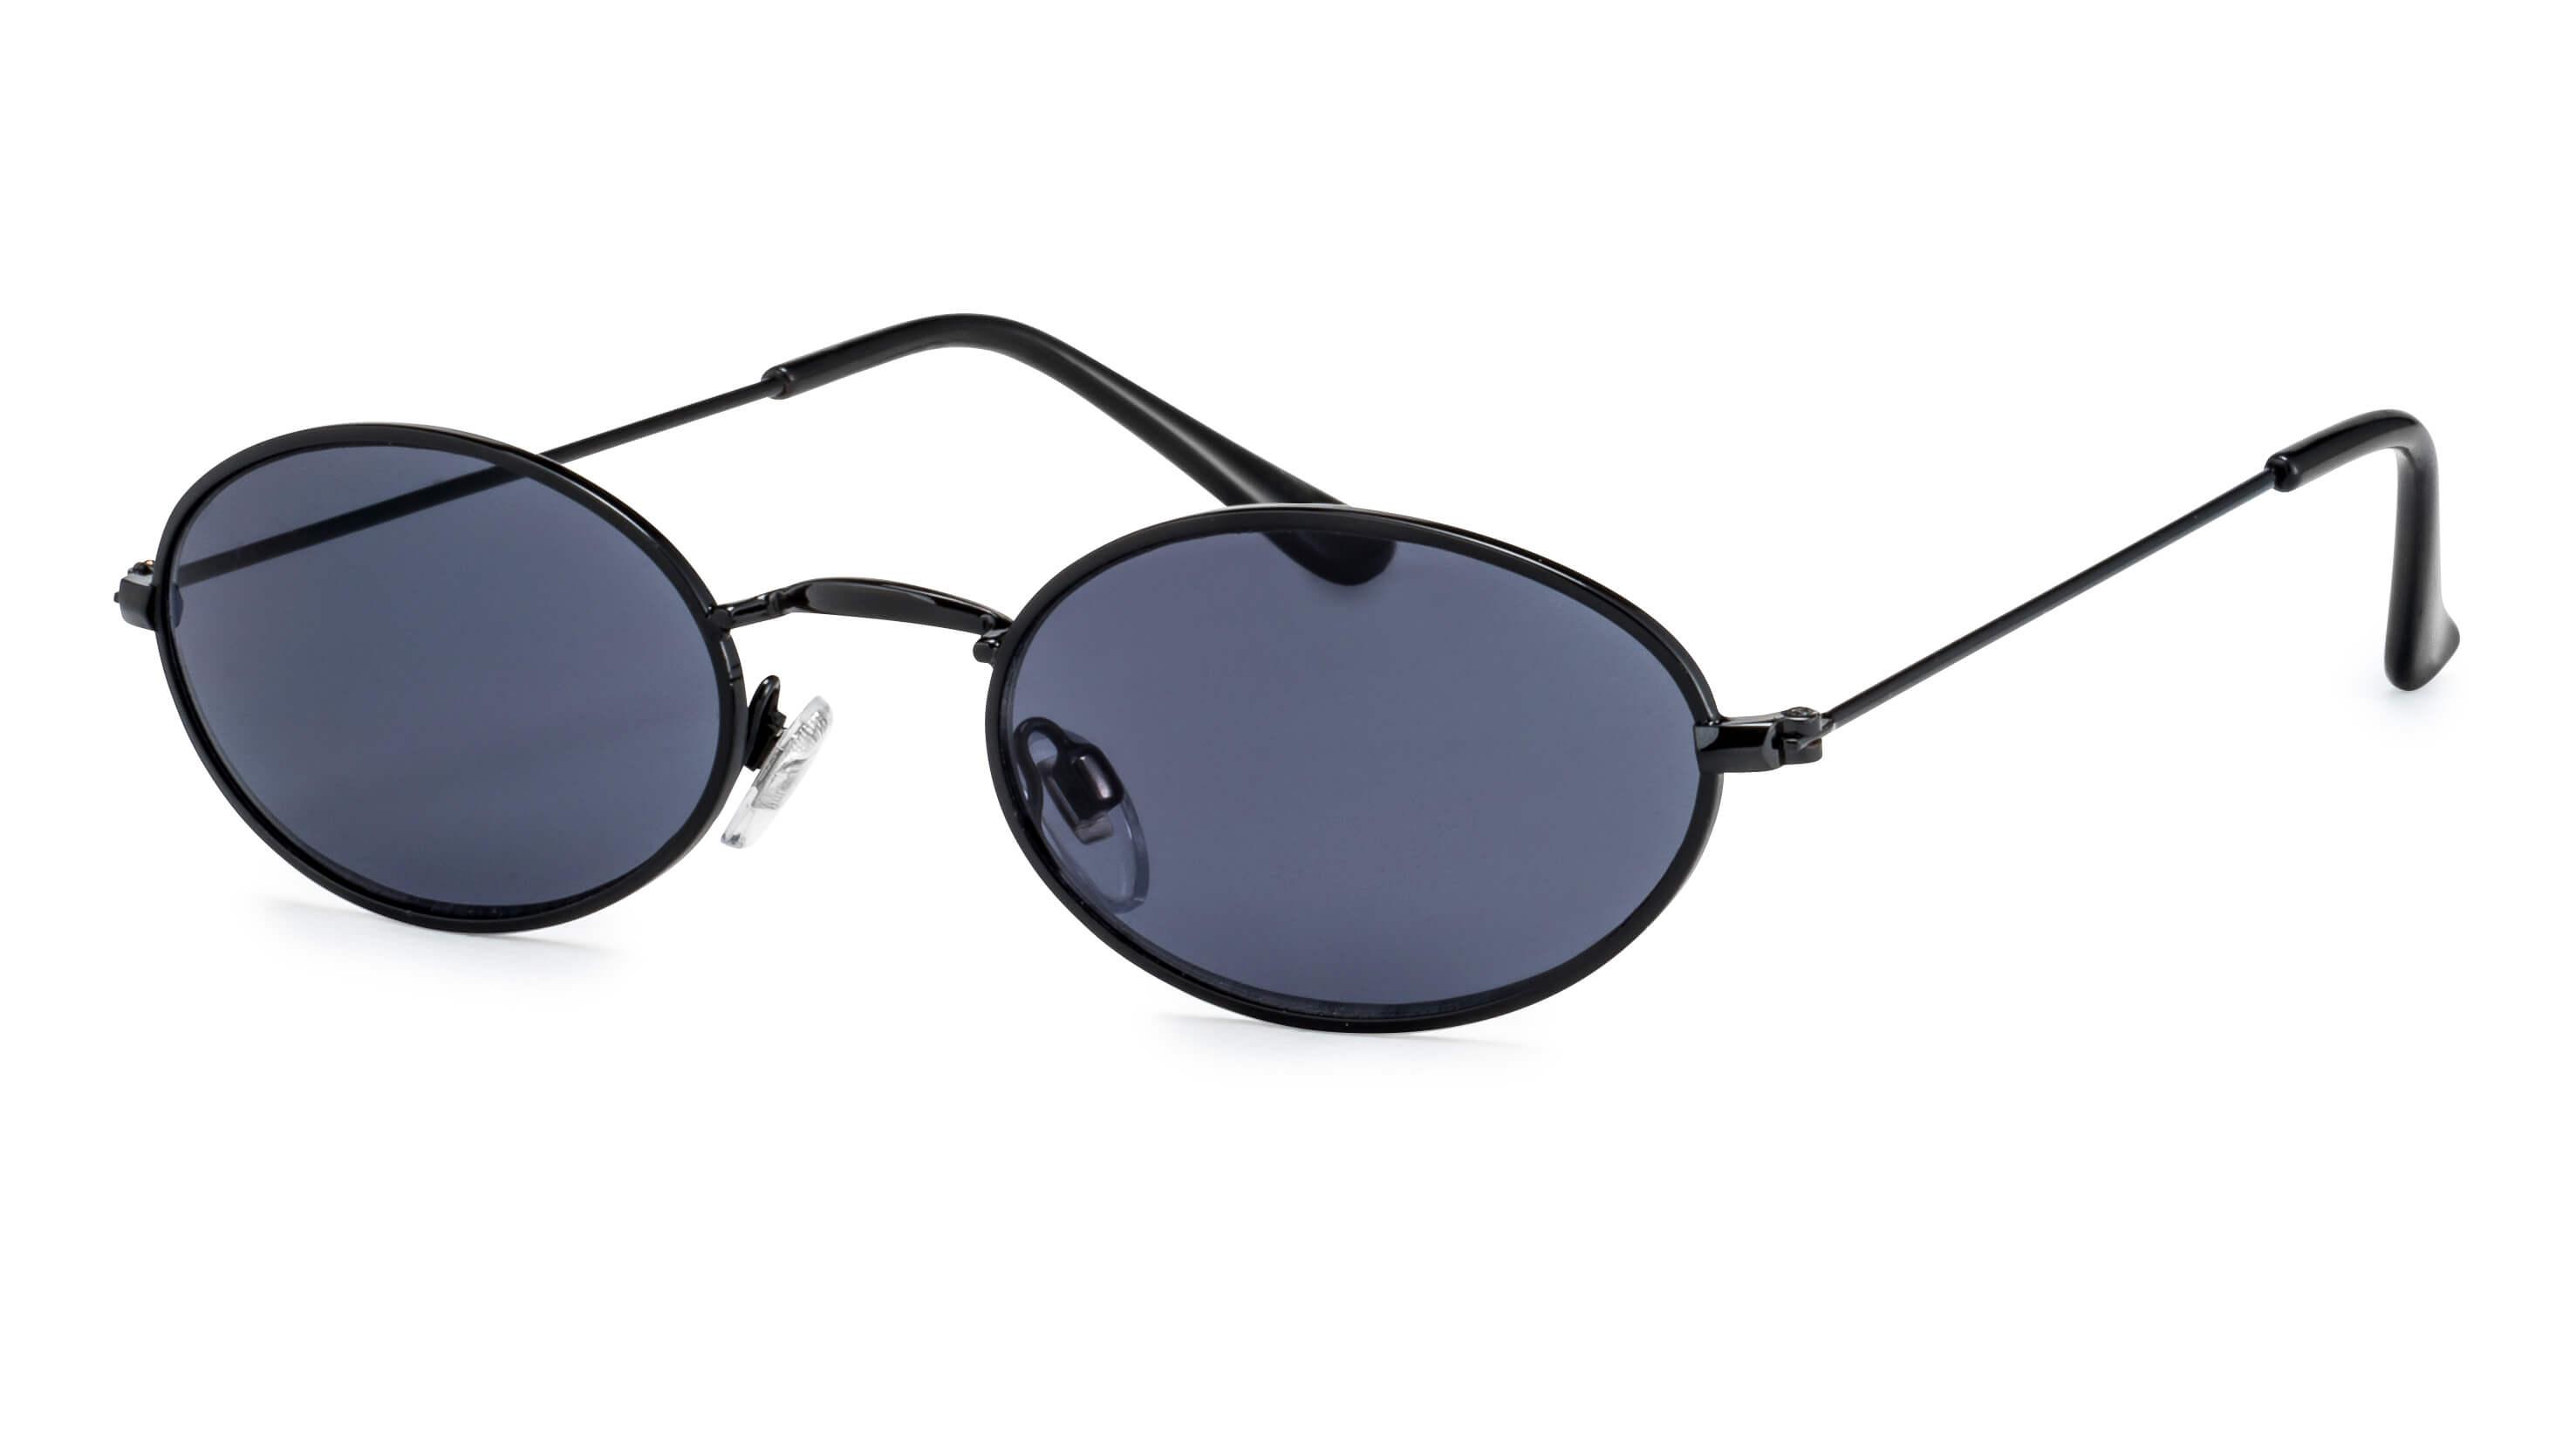 Main view sunglasses F3001110